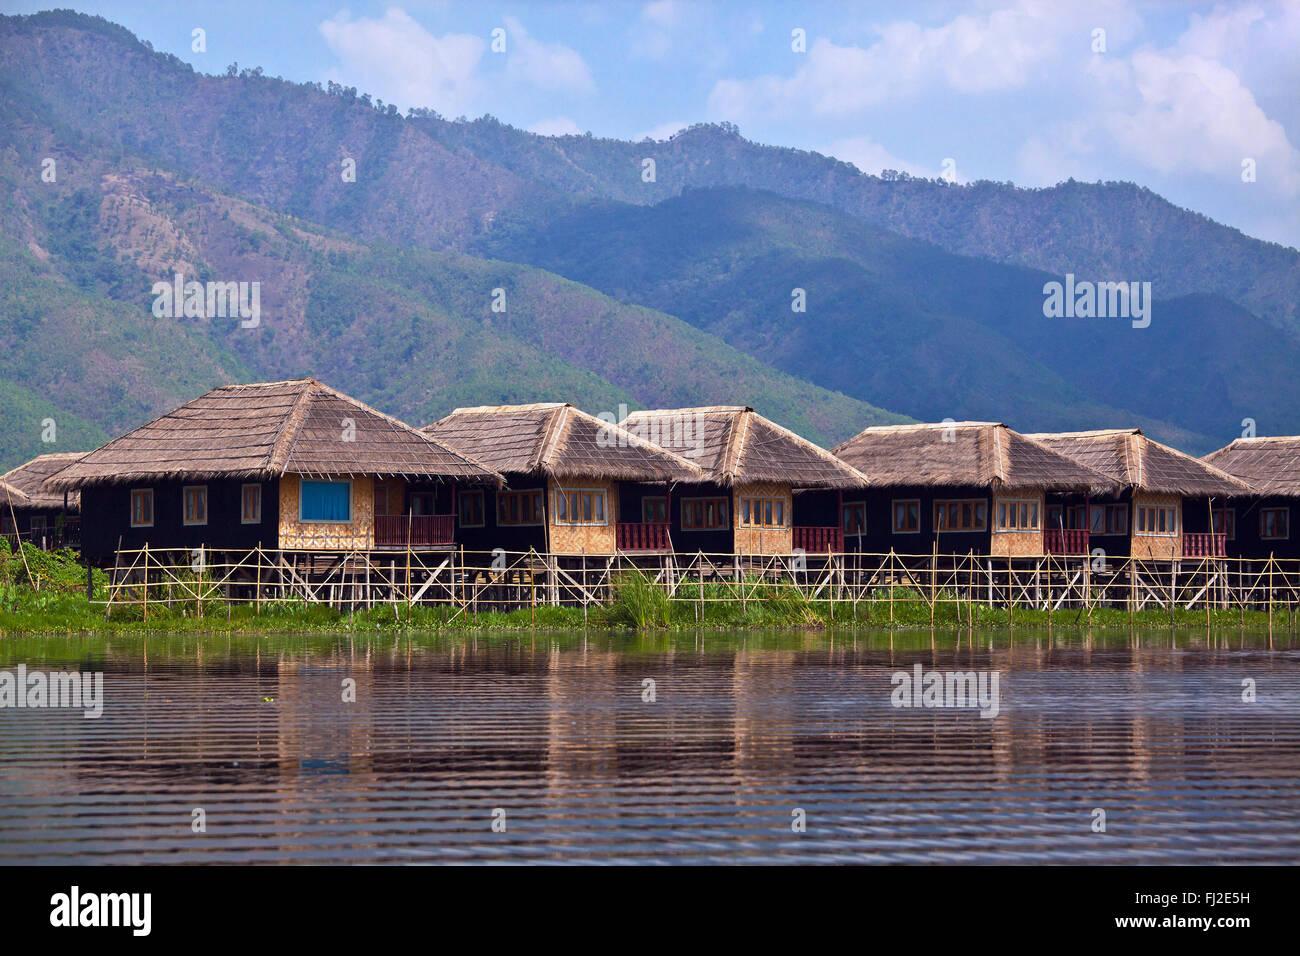 SKY LAKE RESORT consists of individual bungalos built on stilts on INLE LAKE - MYANMAR - Stock Image